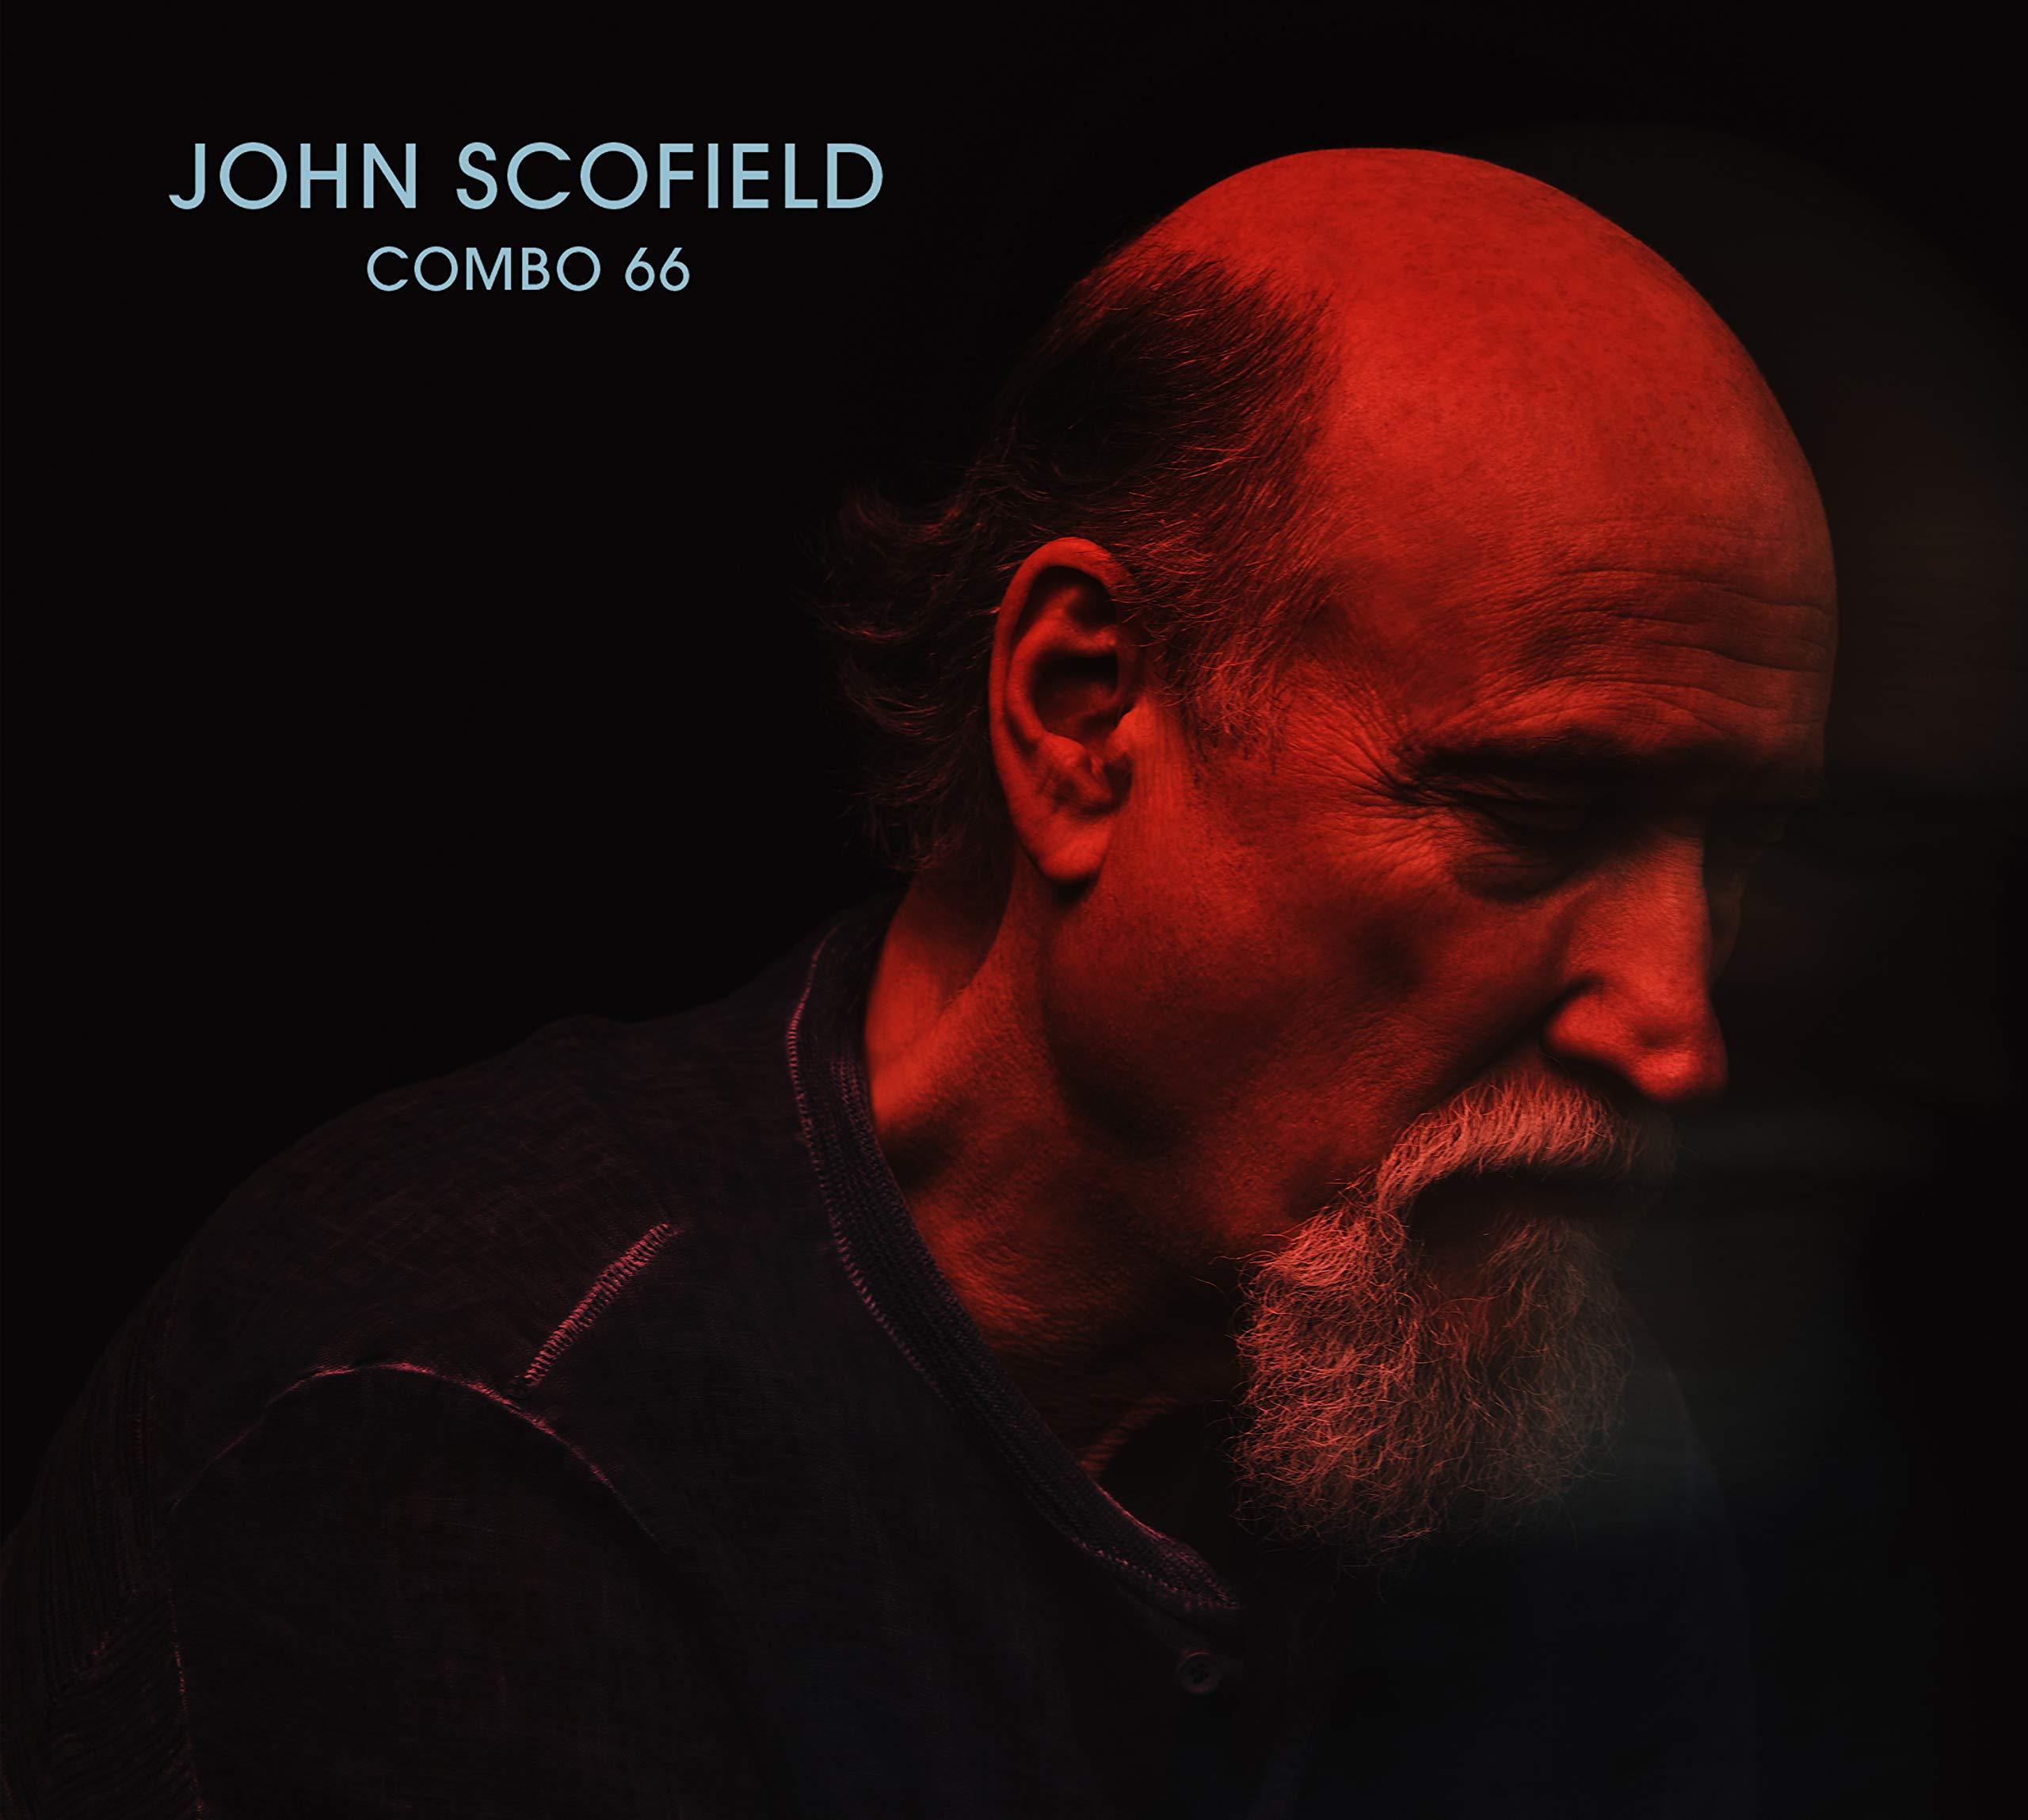 CD : John Scofield - Combo 66